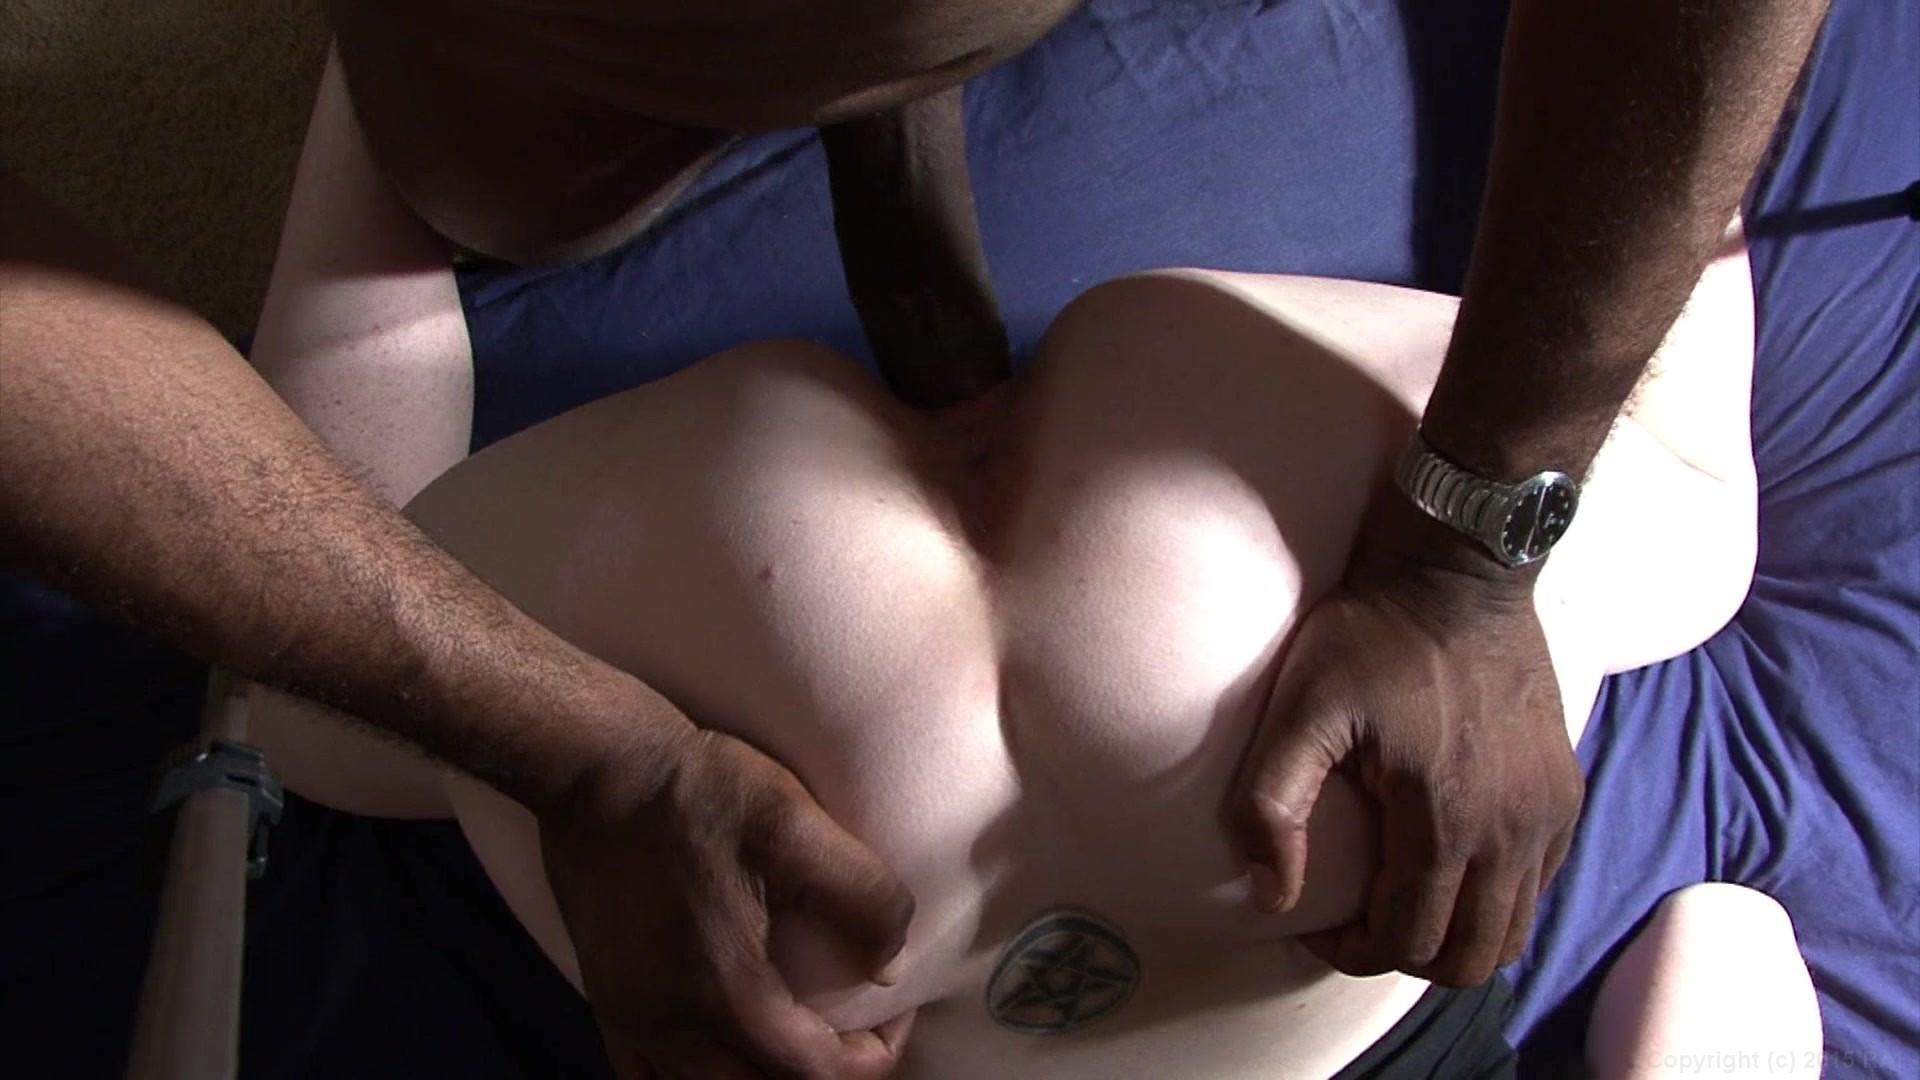 image Shaundamxxx big titties in the big city